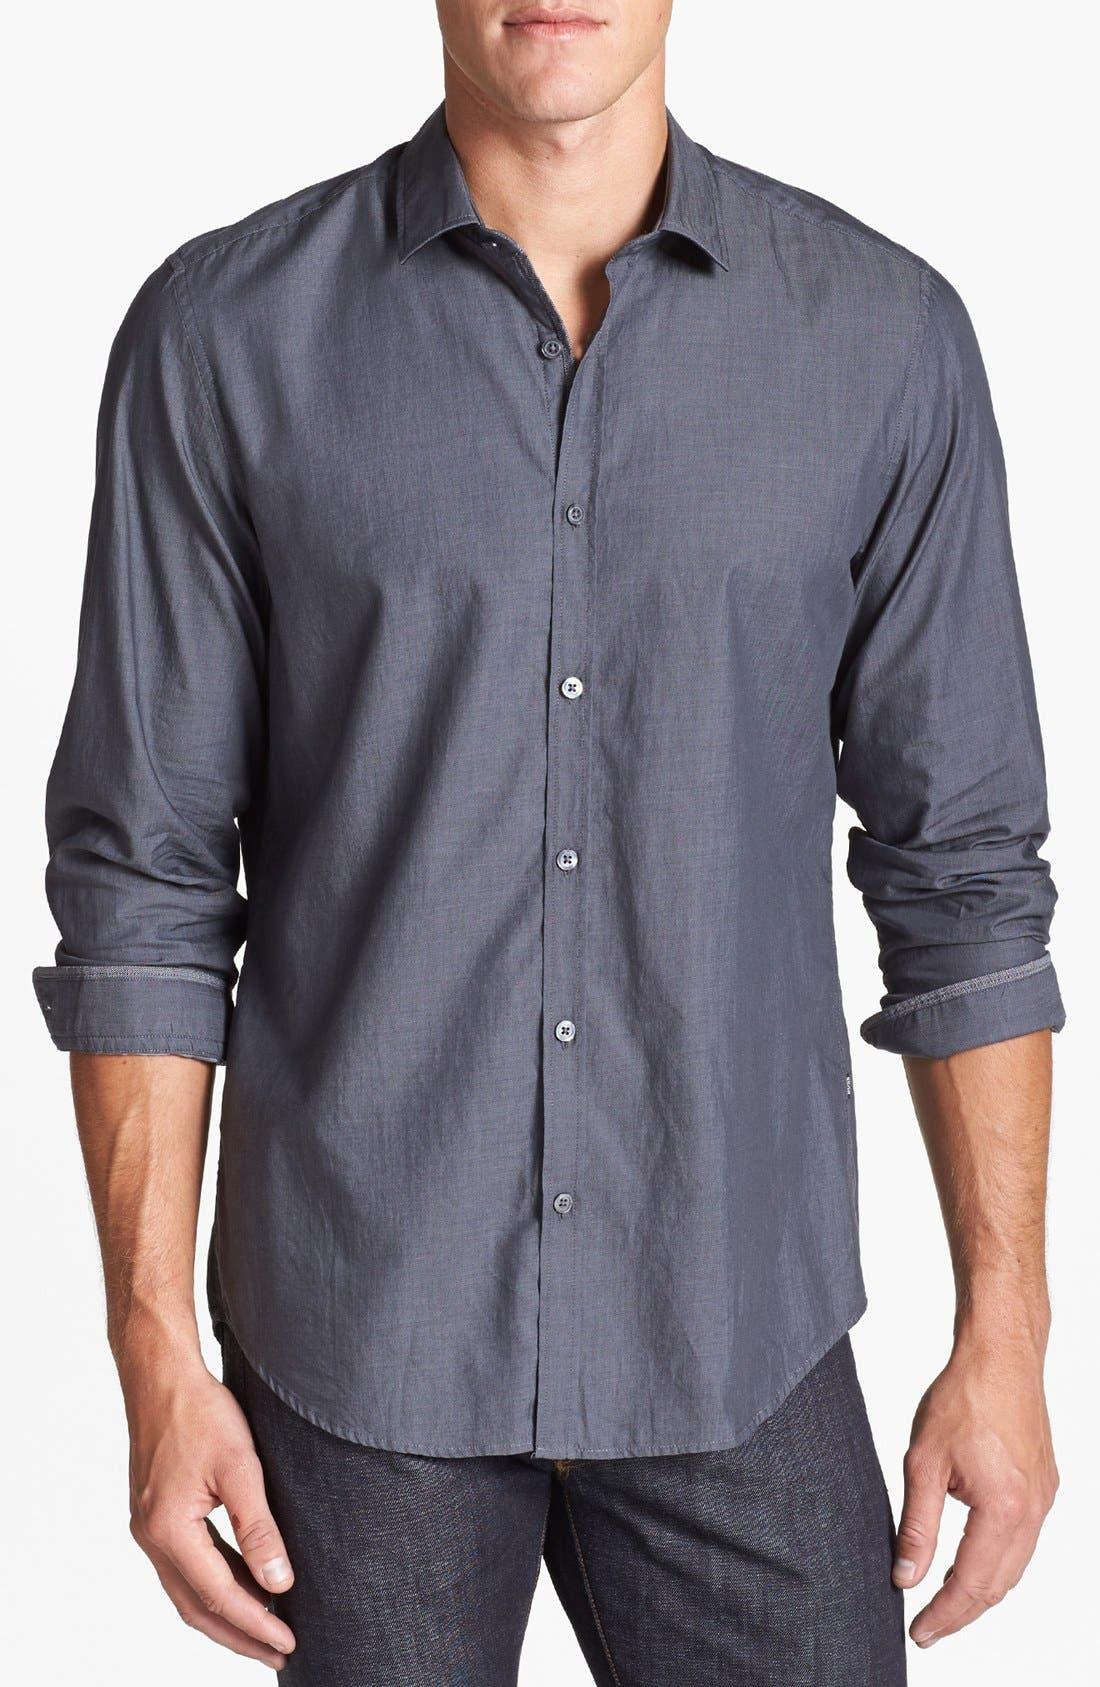 Alternate Image 1 Selected - BOSS HUGO BOSS 'Lorenzo' Regular Fit Chambray Sport Shirt